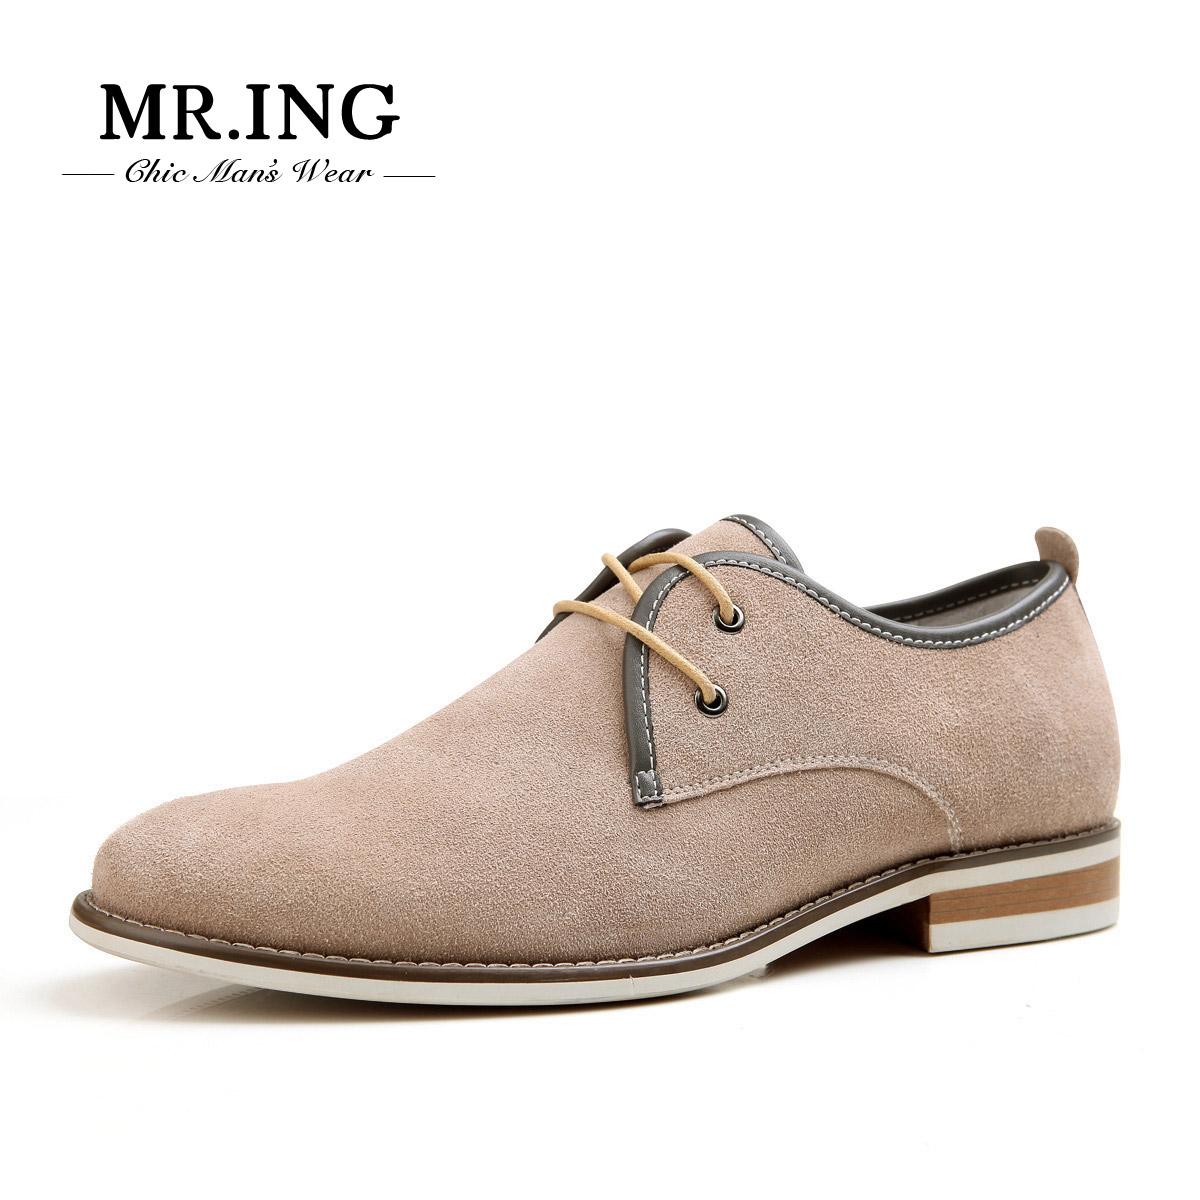 Mr.ing米斯特因 休闲男鞋漠河英伦绅士反绒低帮潮流男士皮鞋A119 价格:199.00